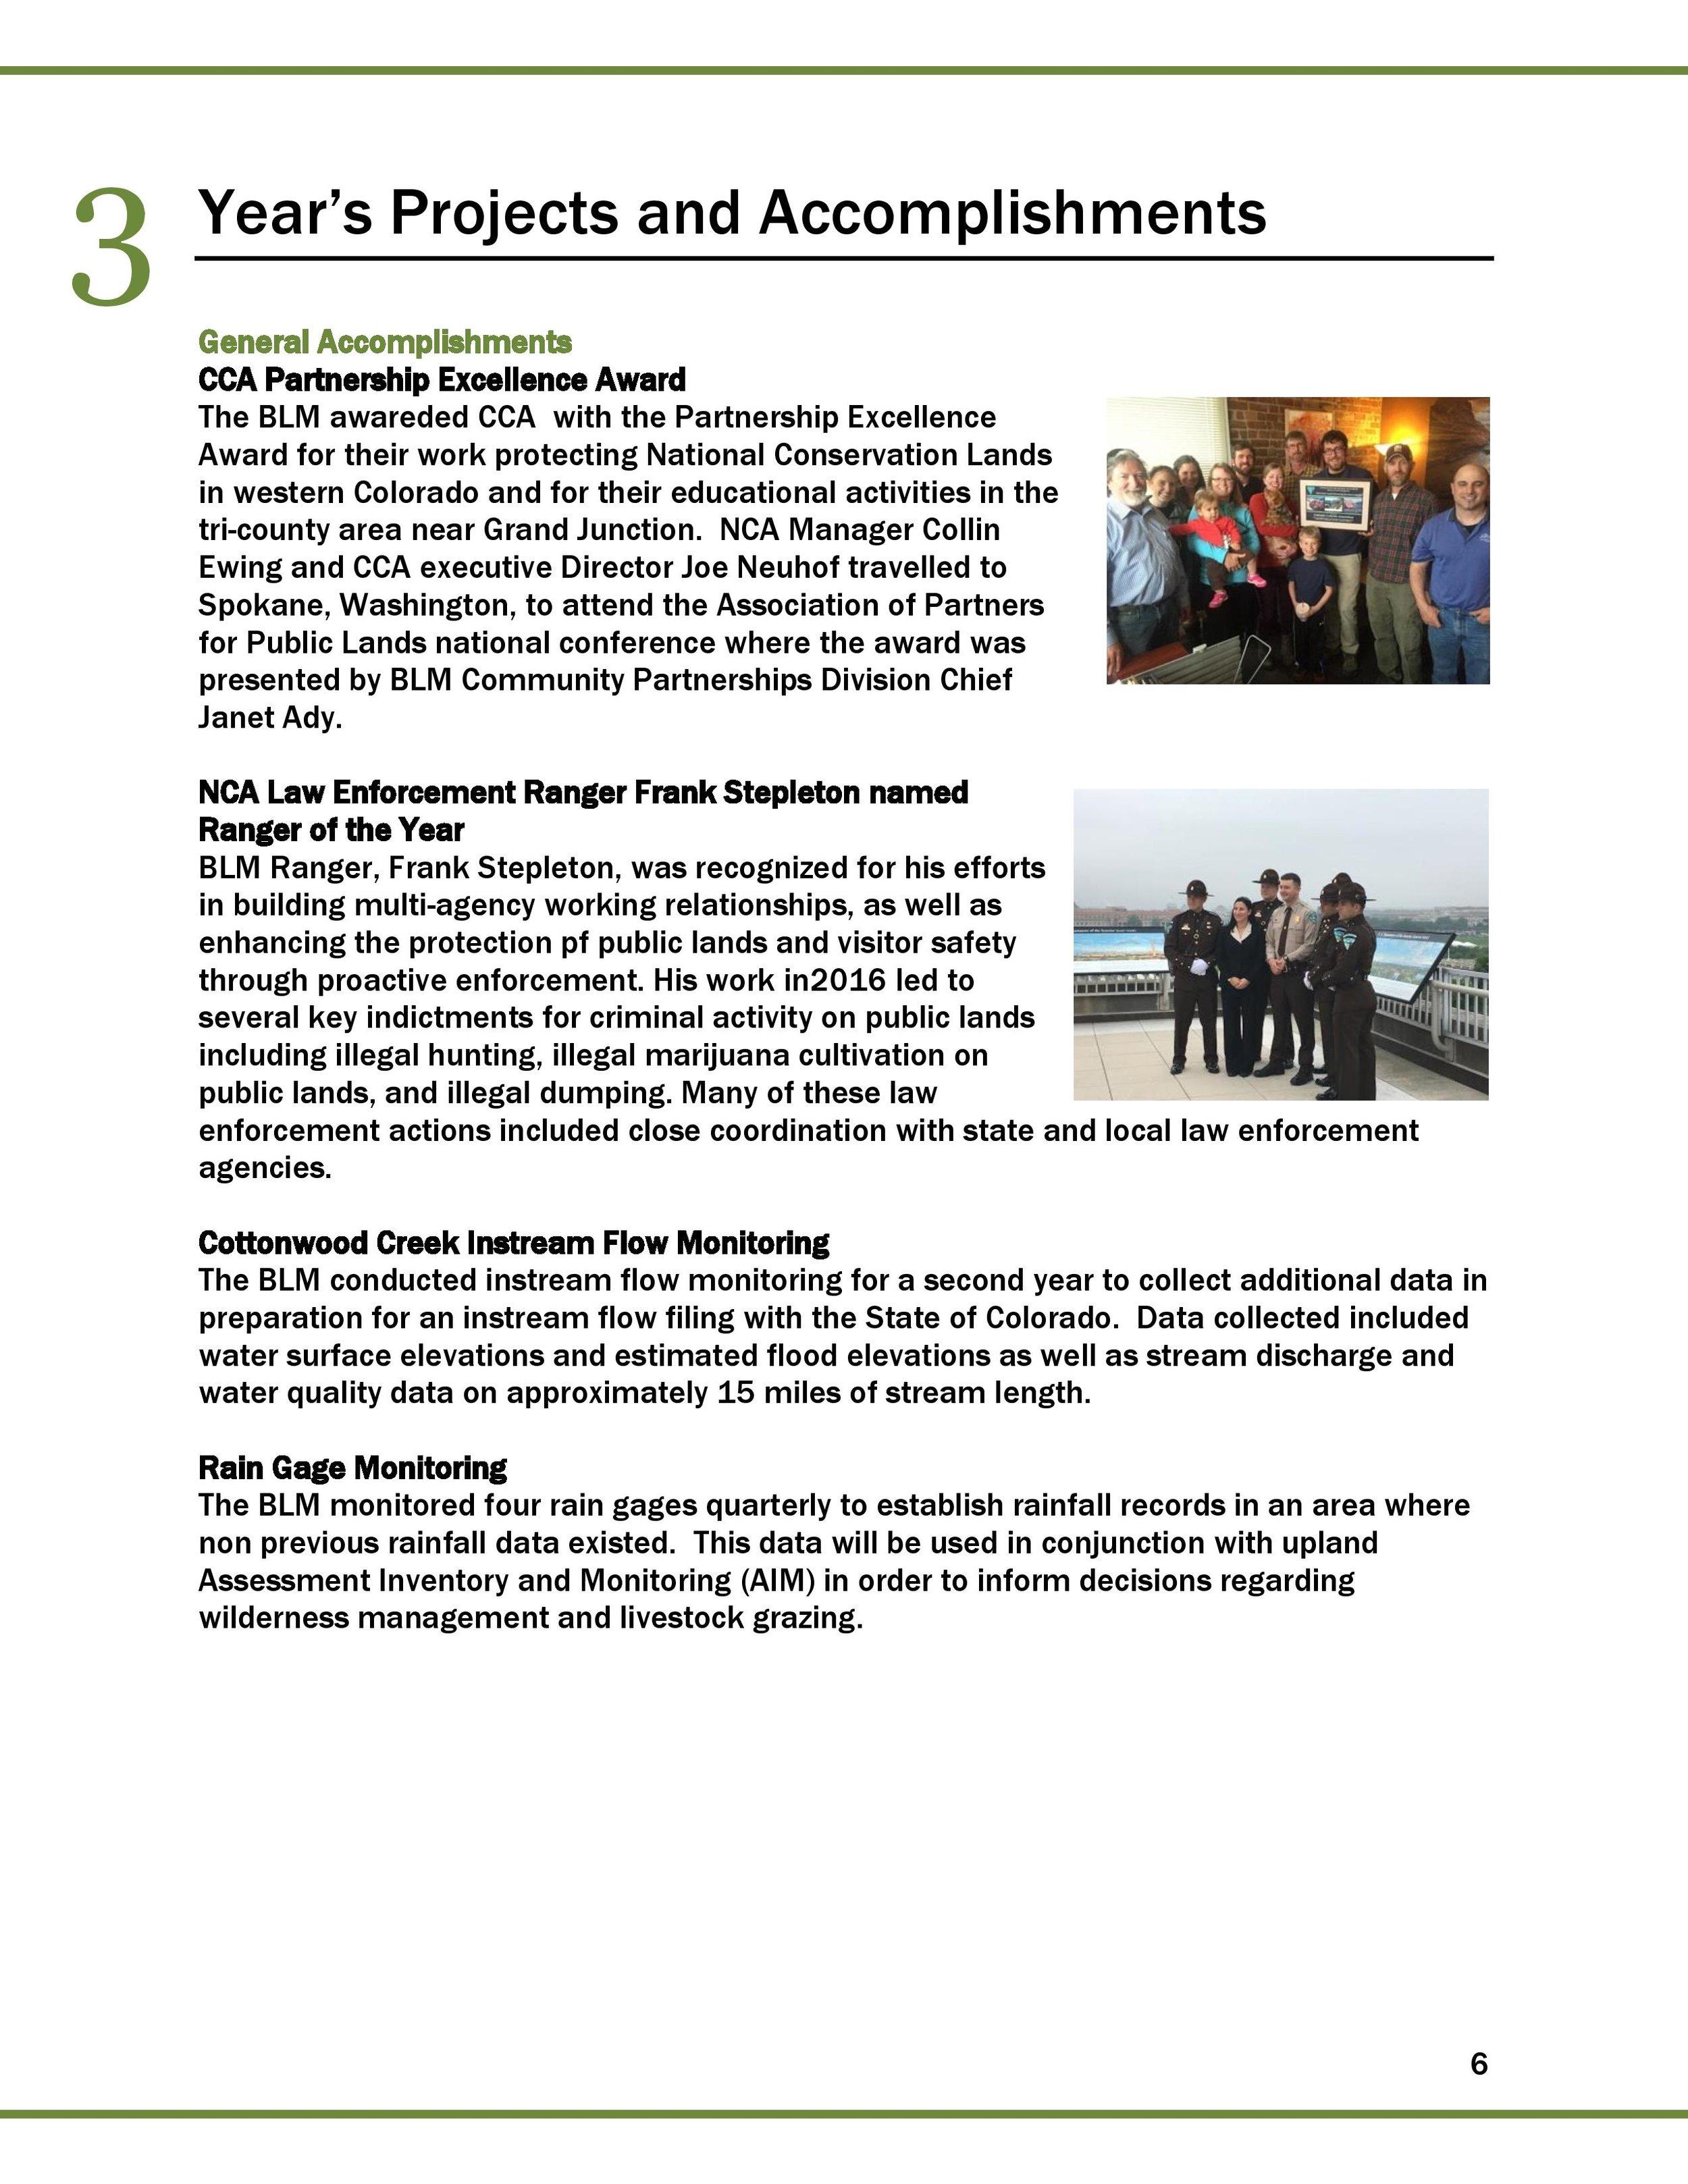 2016 FINAL DENCA REPORT_2017_01_09-page-007.jpg